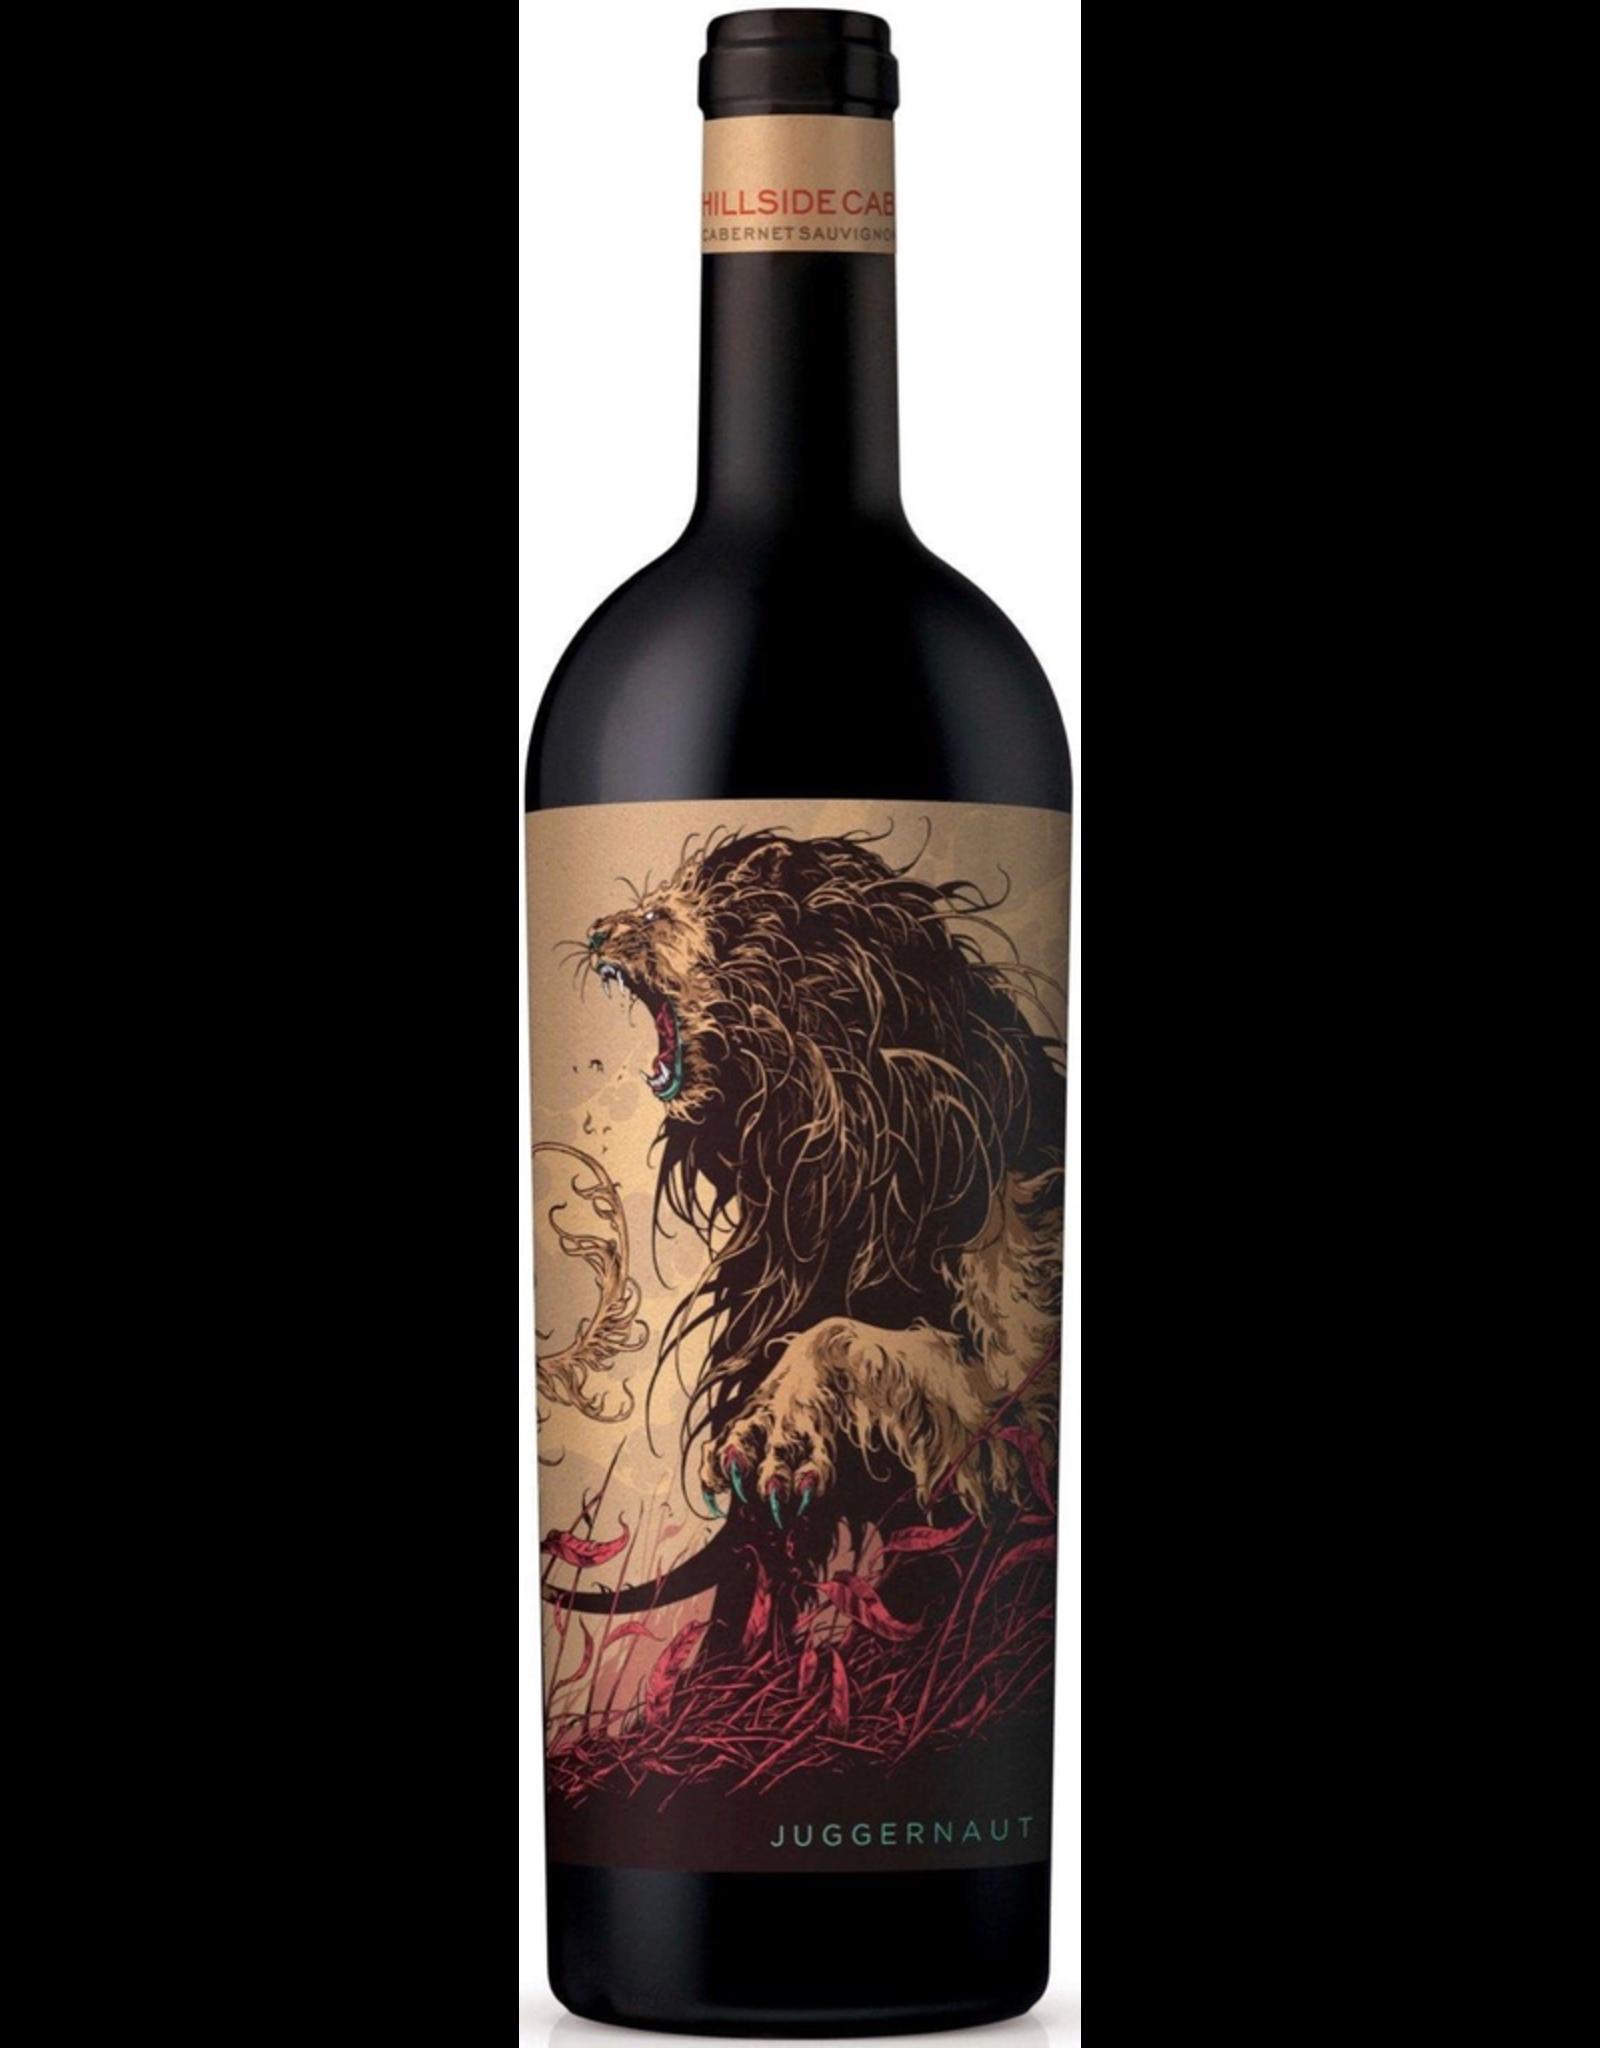 Red Wine 2018, Juggernaut Hillside, Cabernet Sauvignon, Multi-Regional, Multi AVA, California, 14.5%, CTnr